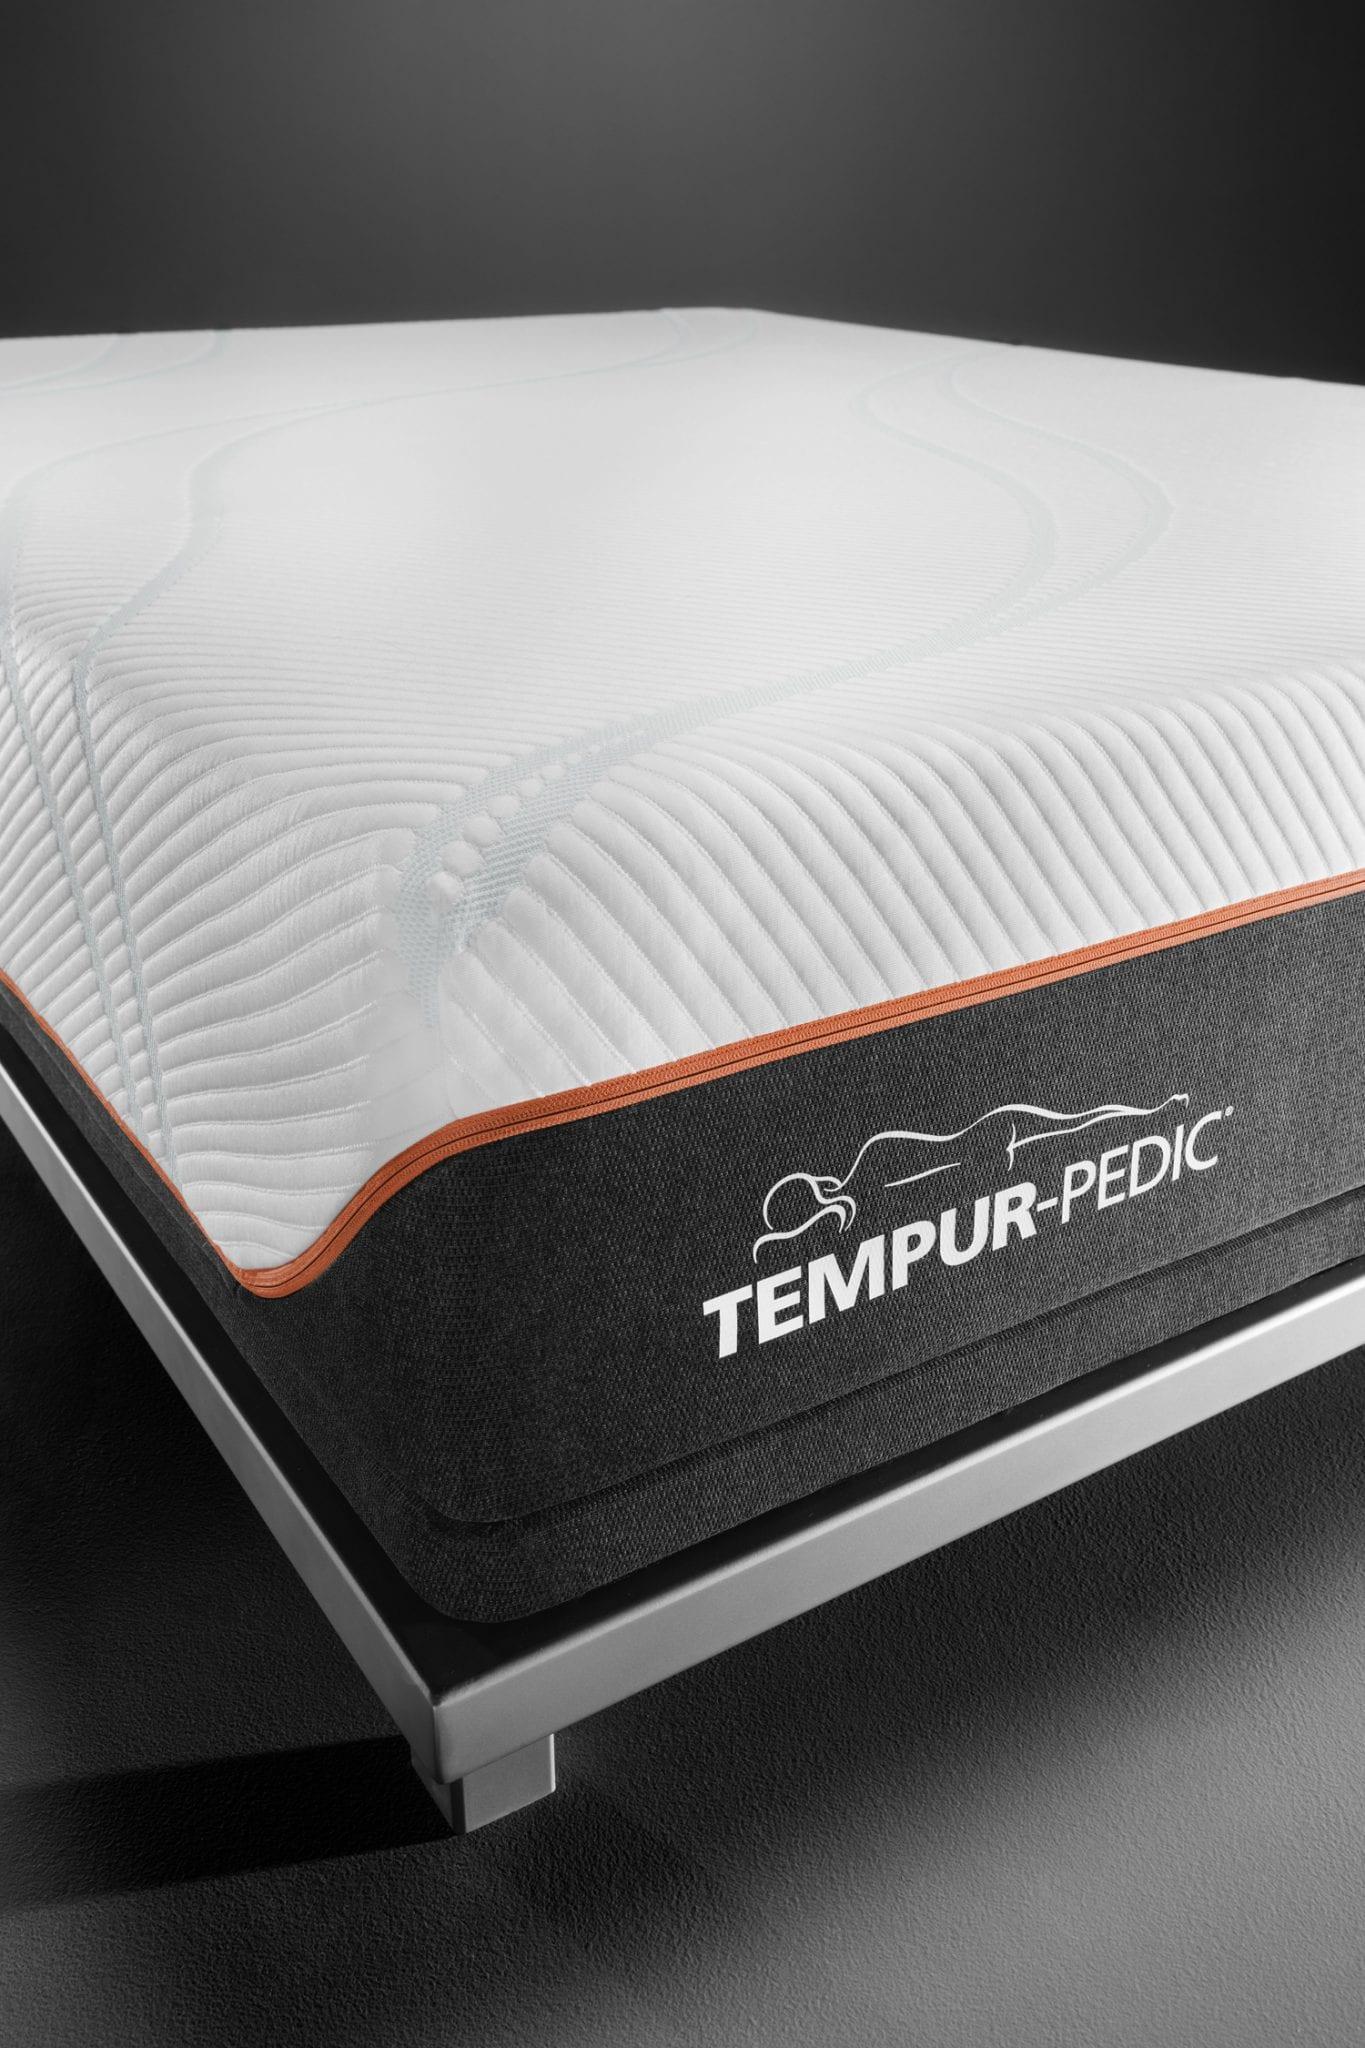 Tempur Pedic Pro Adapt Firm Best Mattress